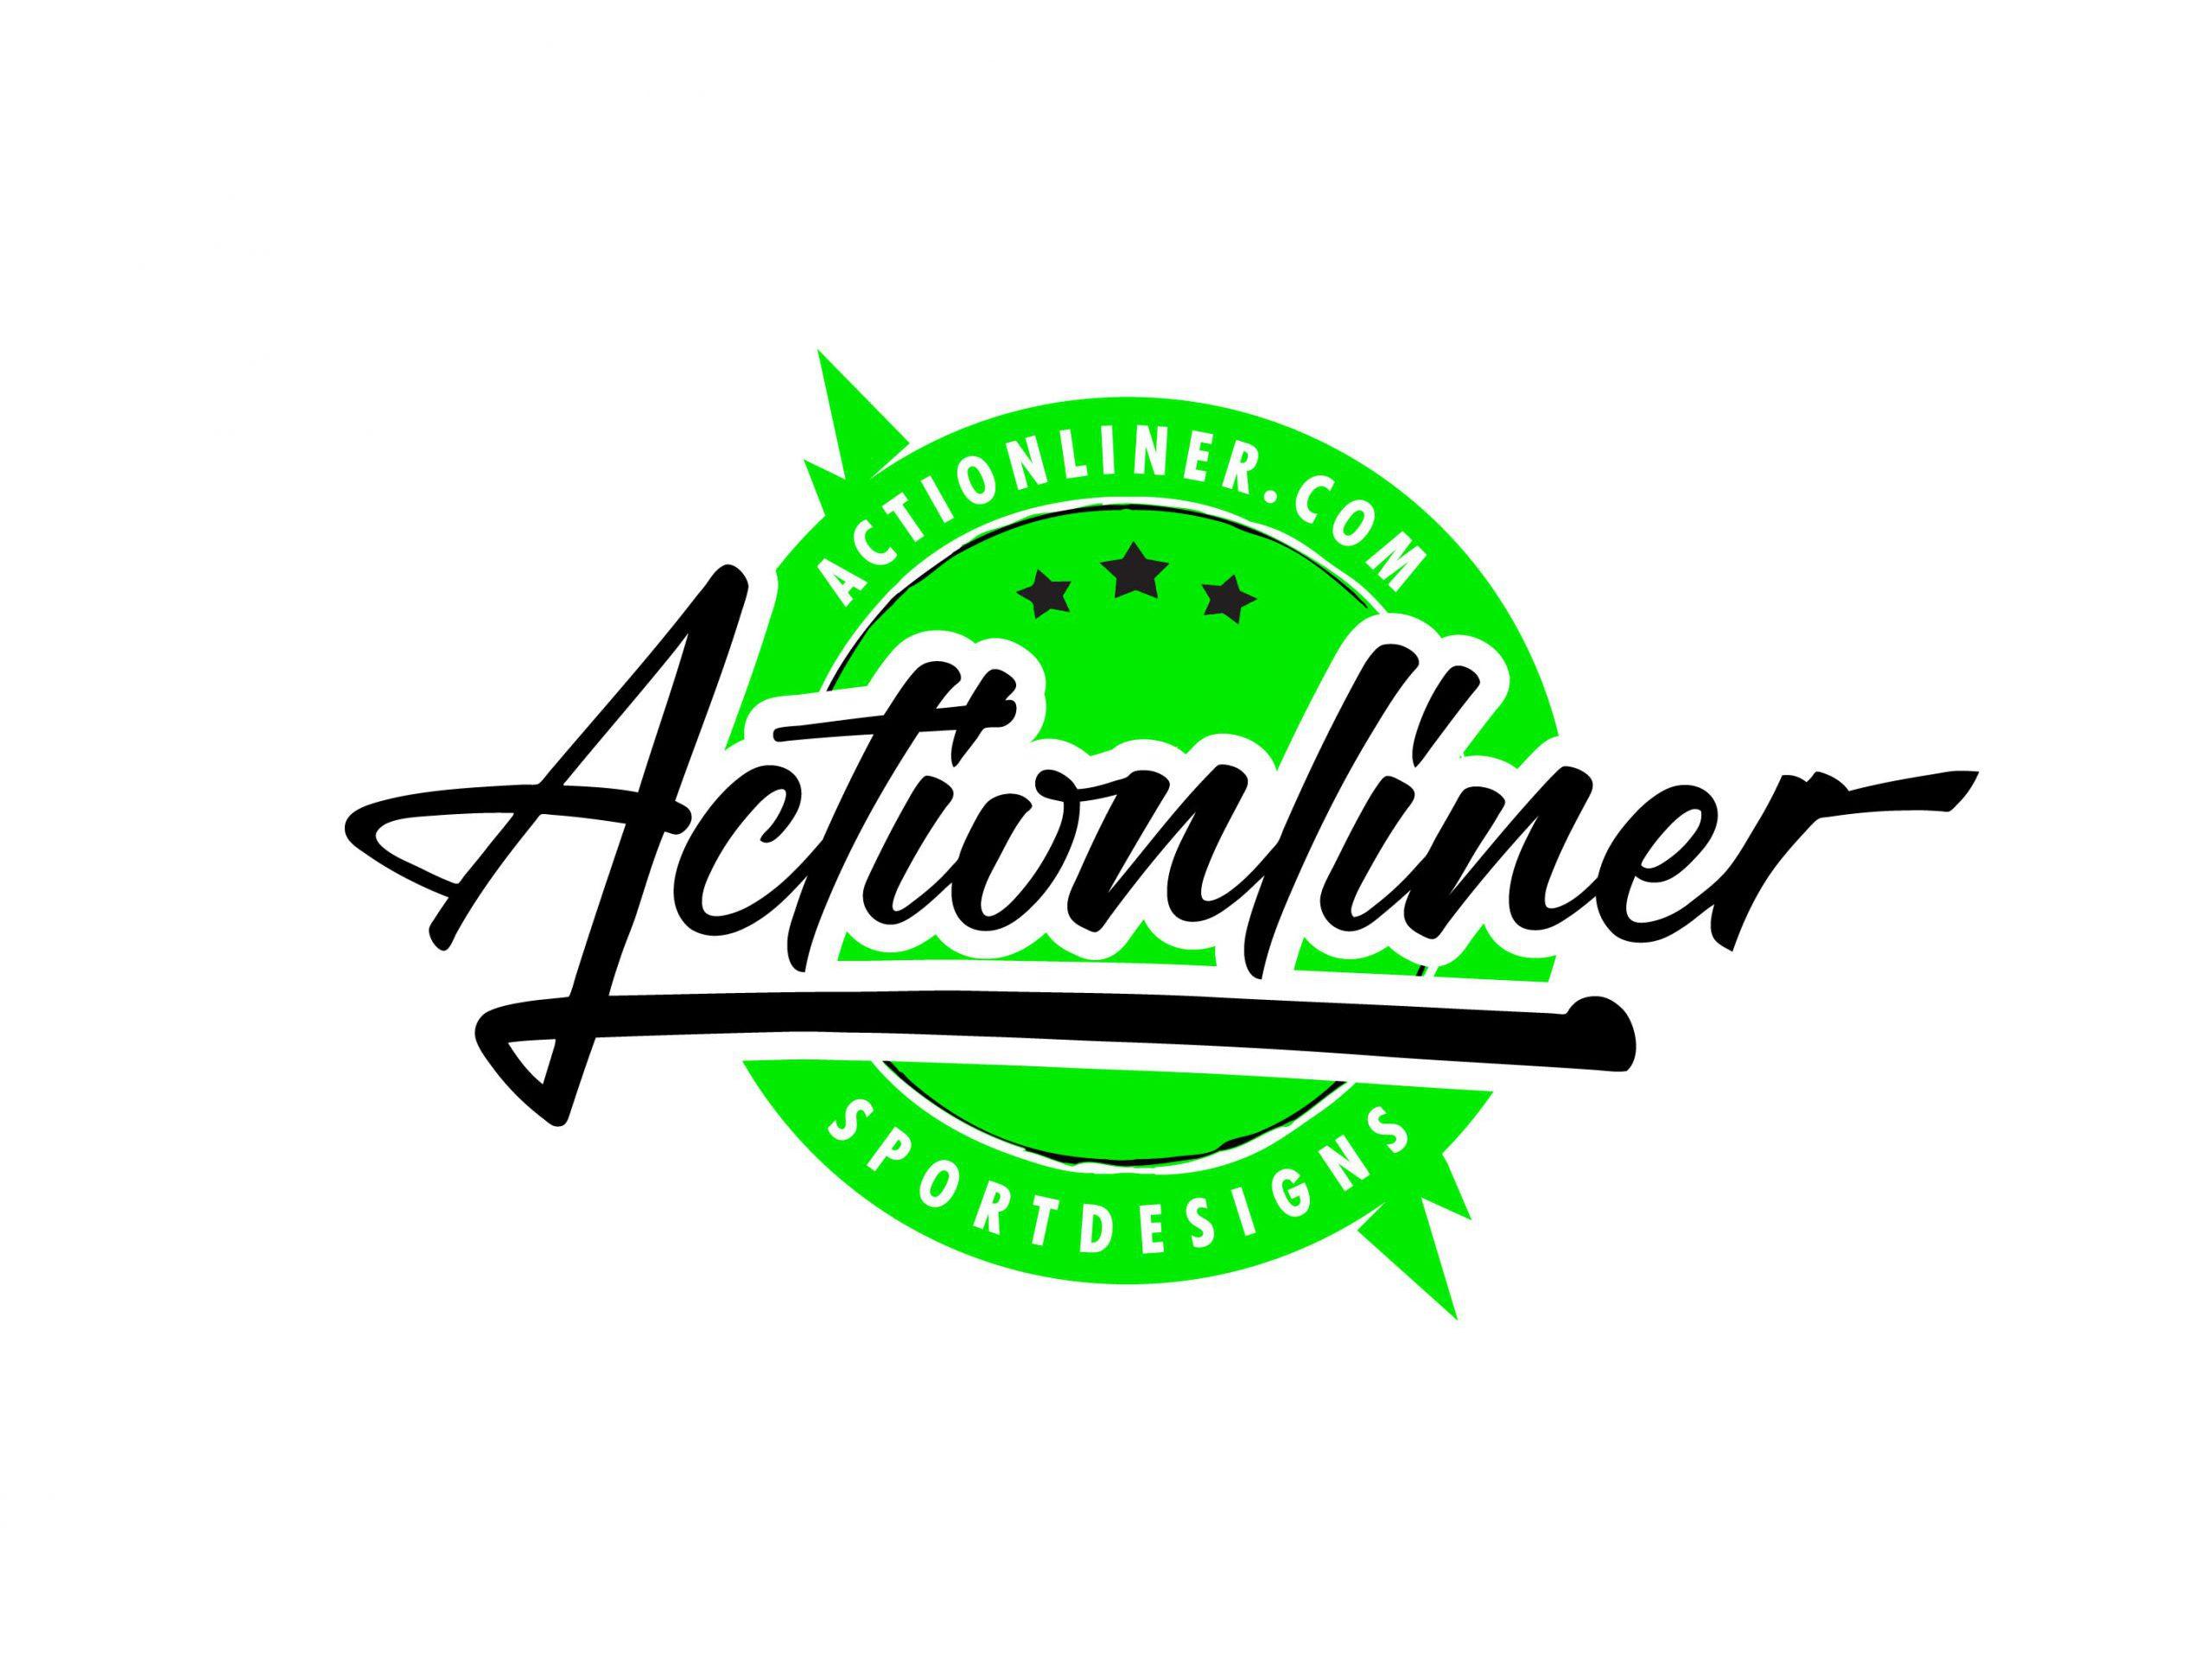 ACTIONLINER DESIGNS